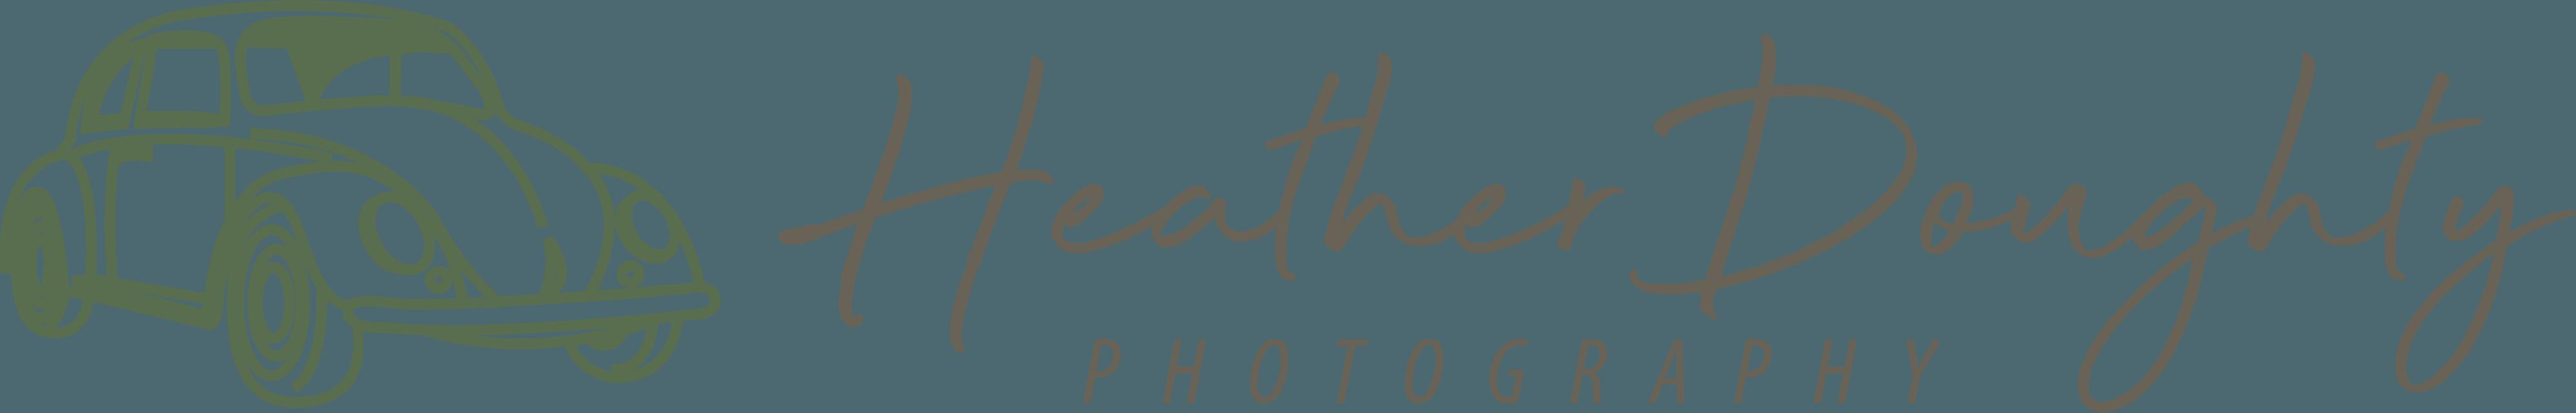 Heather Doughty Photography